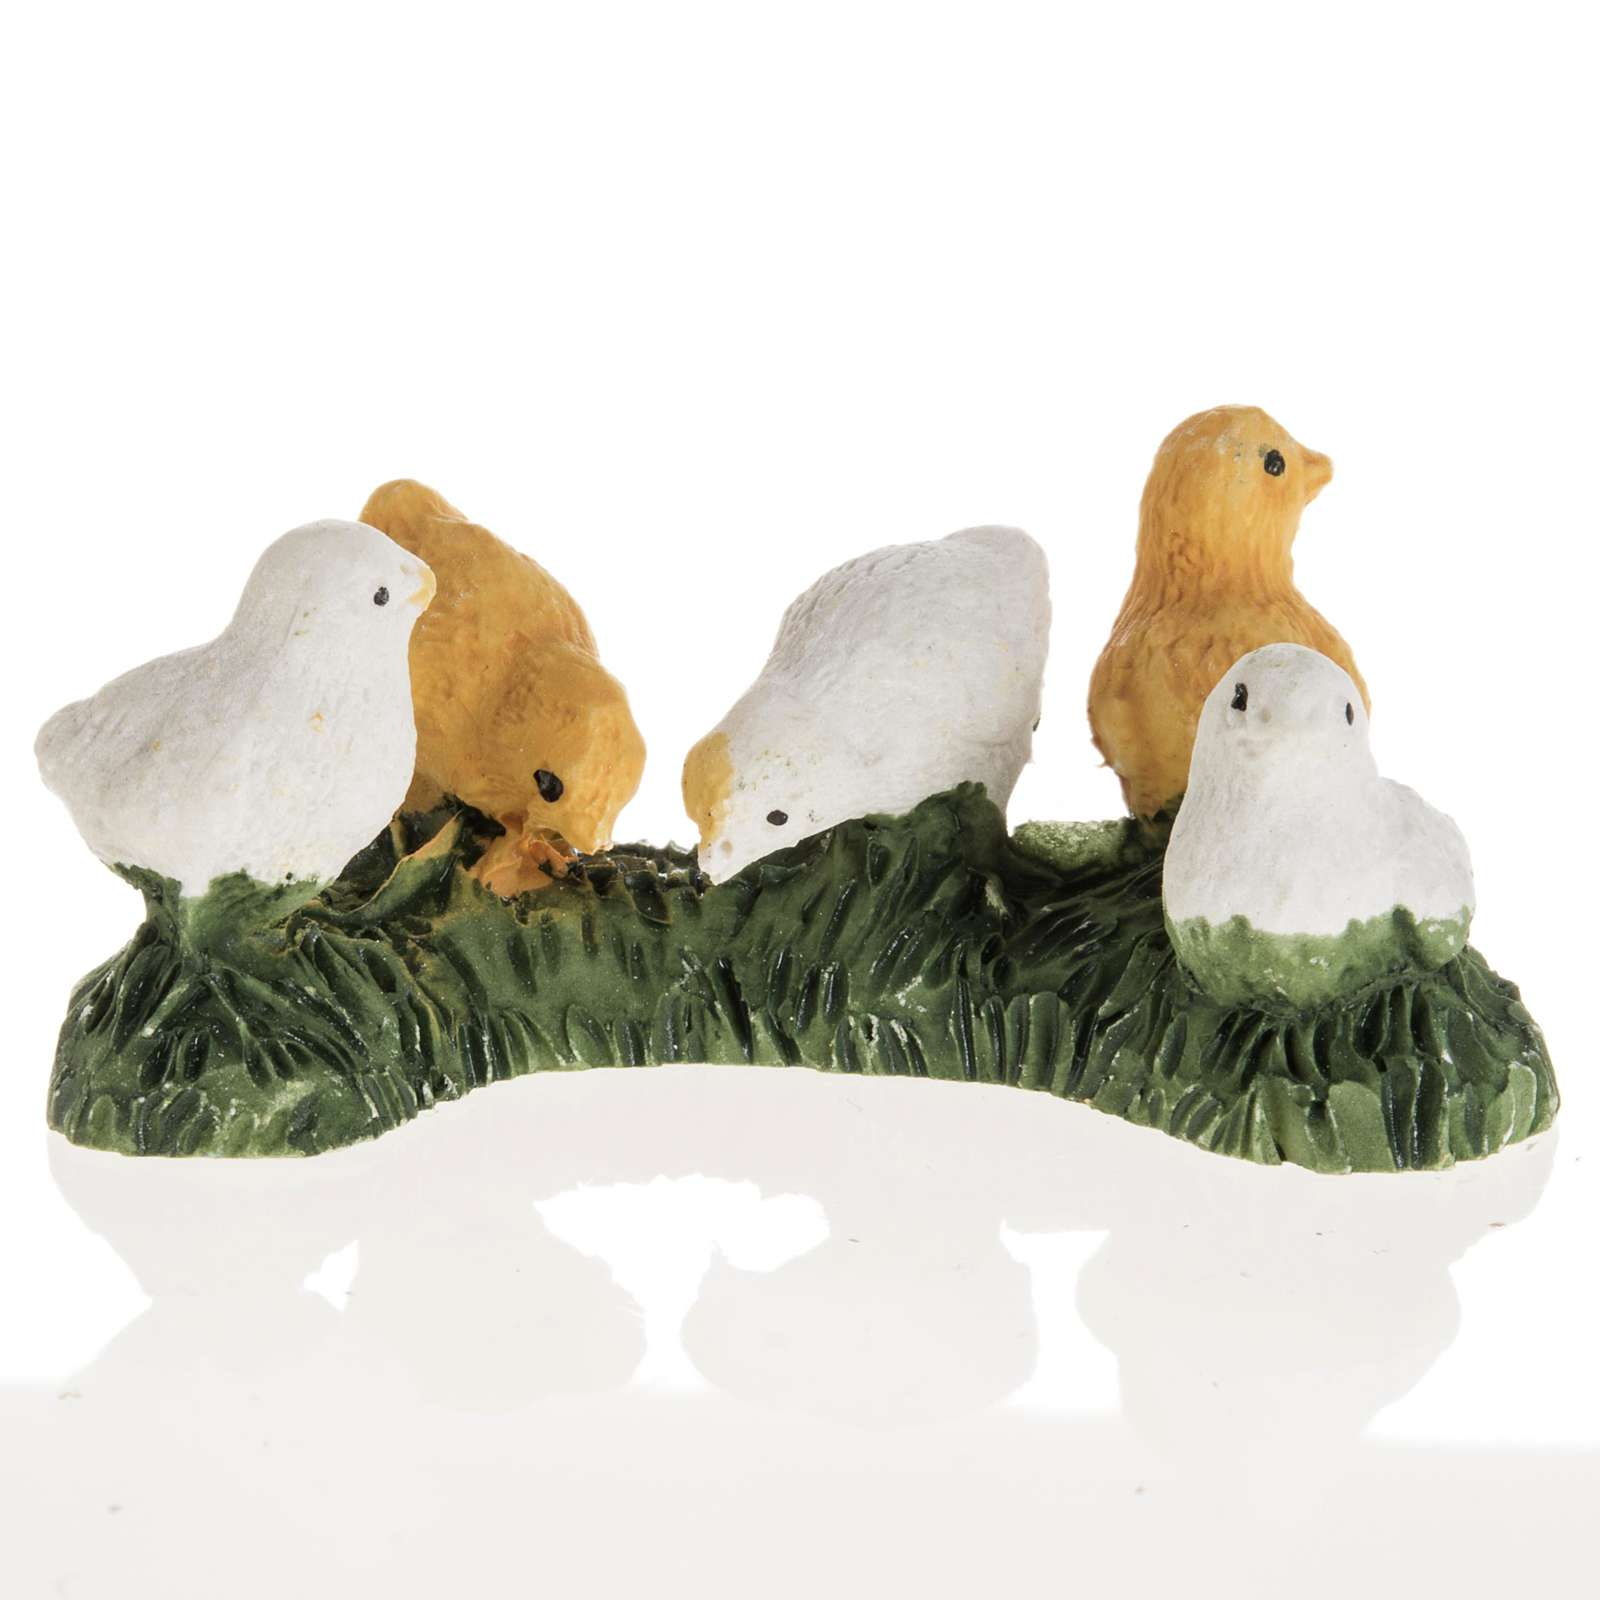 Kurczaki szopka żywica 14 cm 3